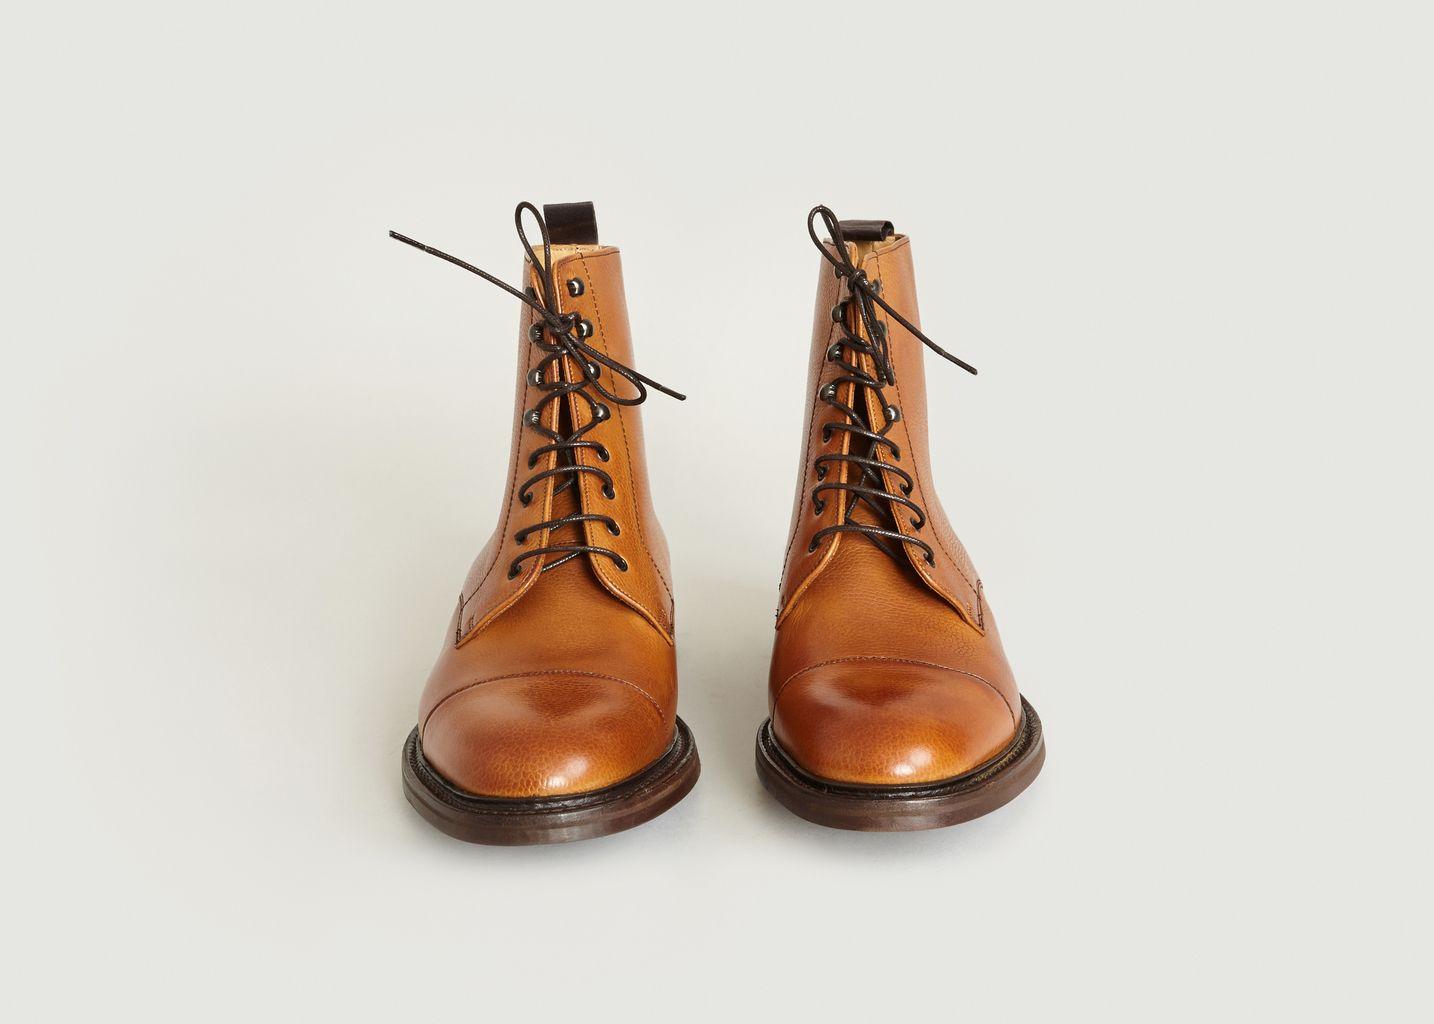 Bottines Lambourn - Barker Shoes